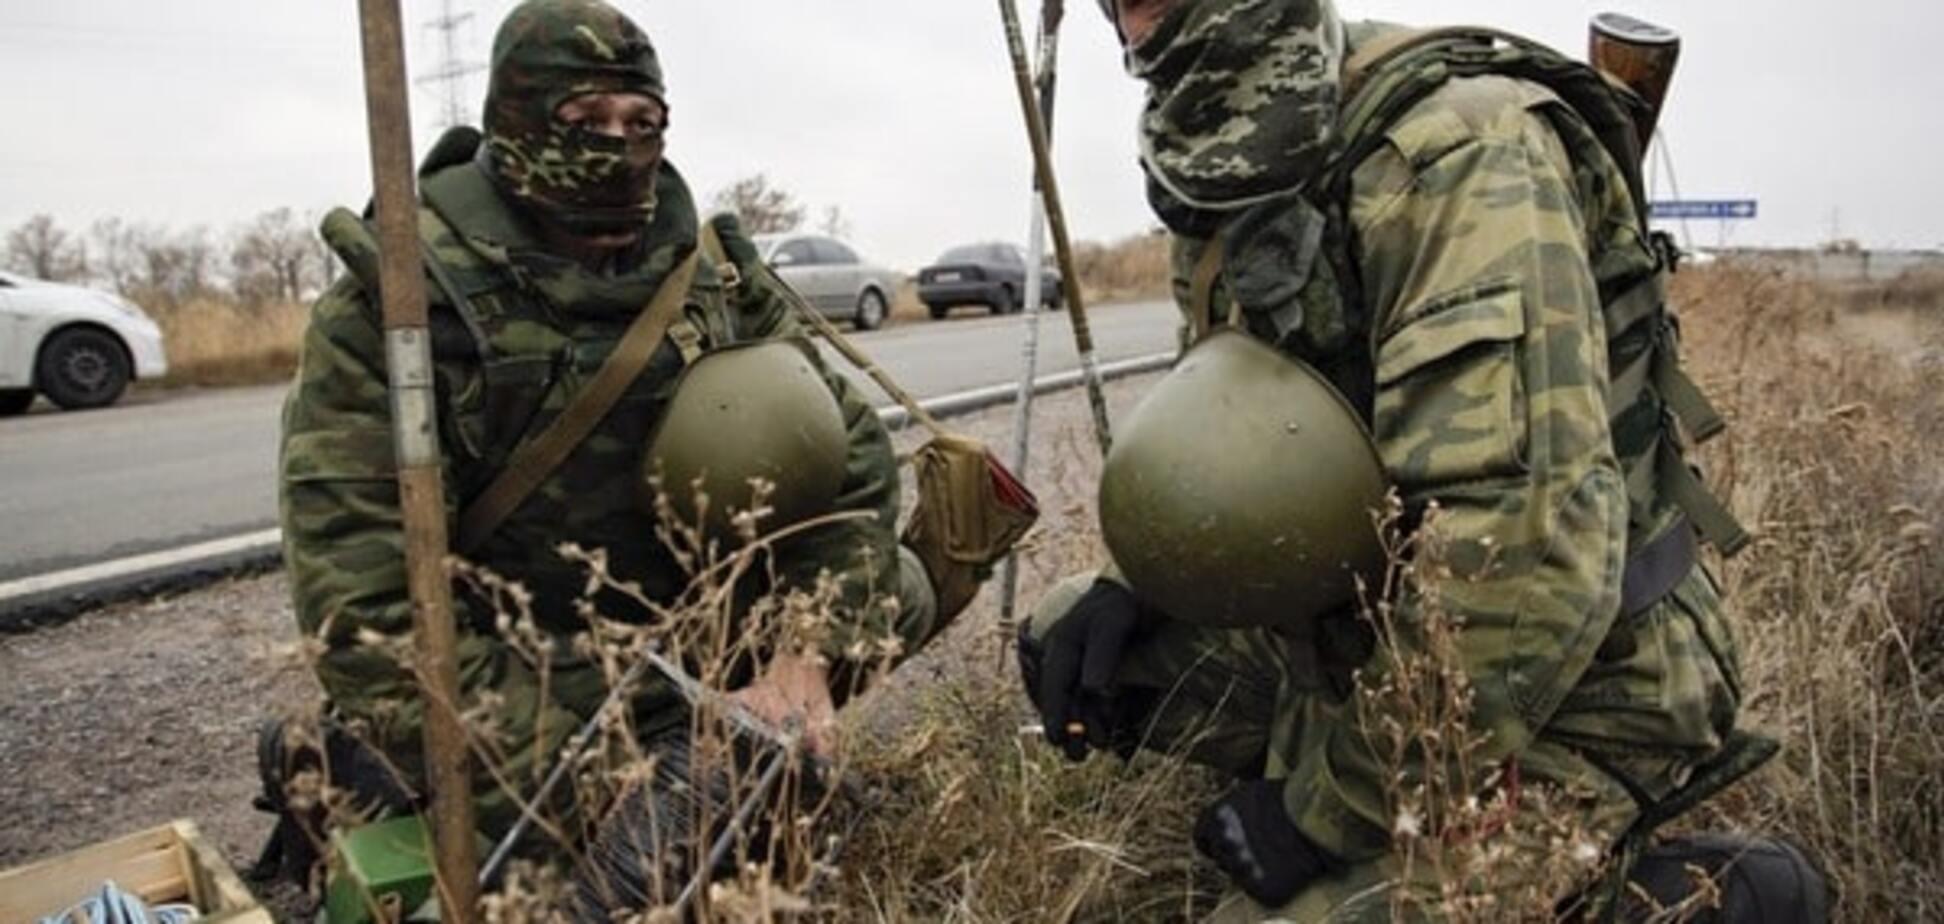 Бойцов АТО в Новозвановке обстреляли из гранатометов и минометов